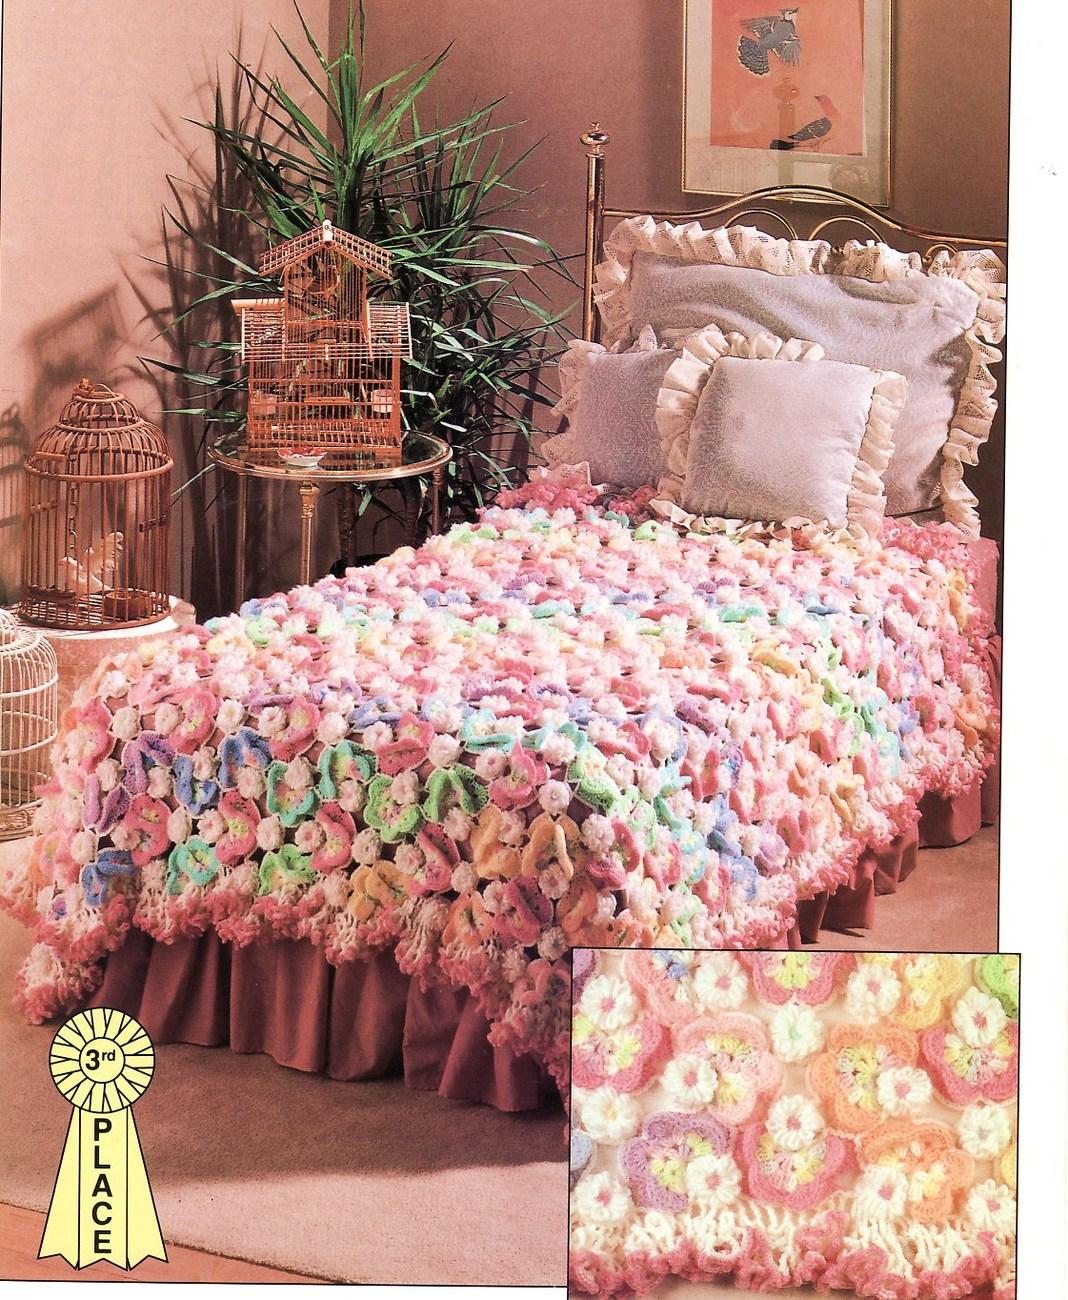 Rainbow Of Butterflies Crochet Pattern Bedspread Blanket Throw Home ...